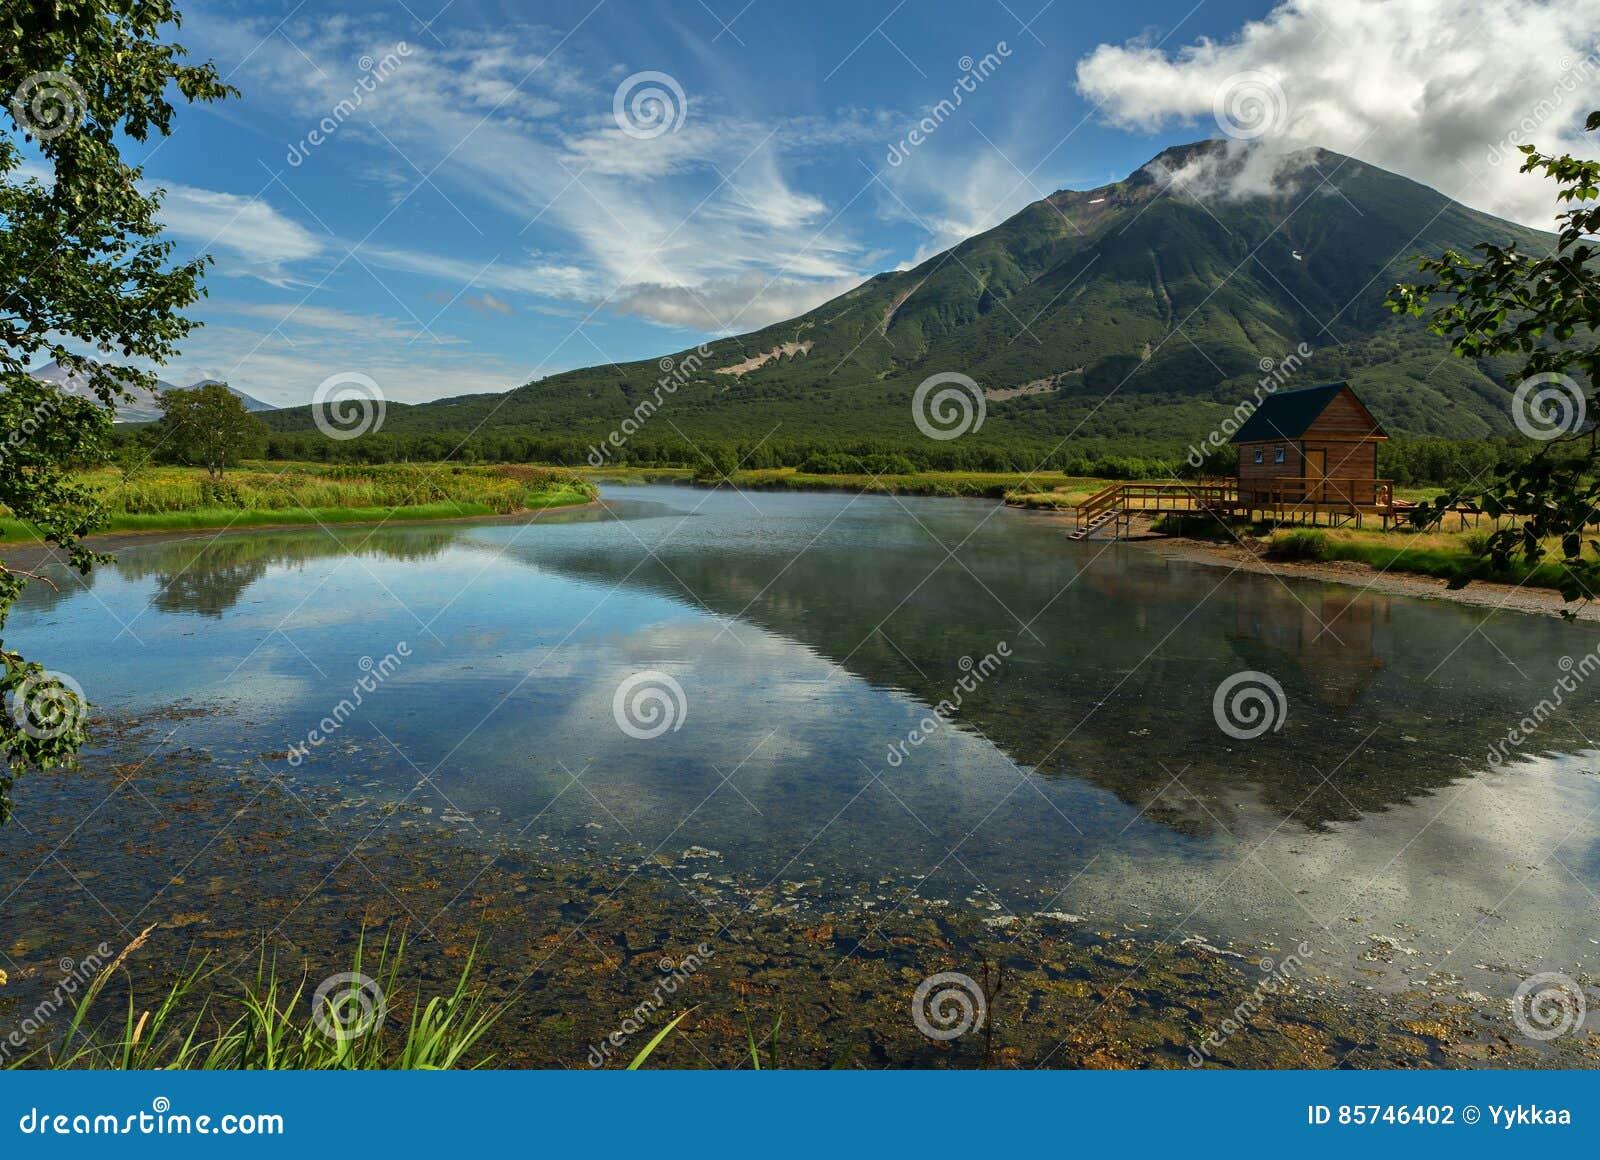 Khodutkinskiye Hot Springs på foten av vulkan Priemysh Den södra Kamchatka naturen parkerar